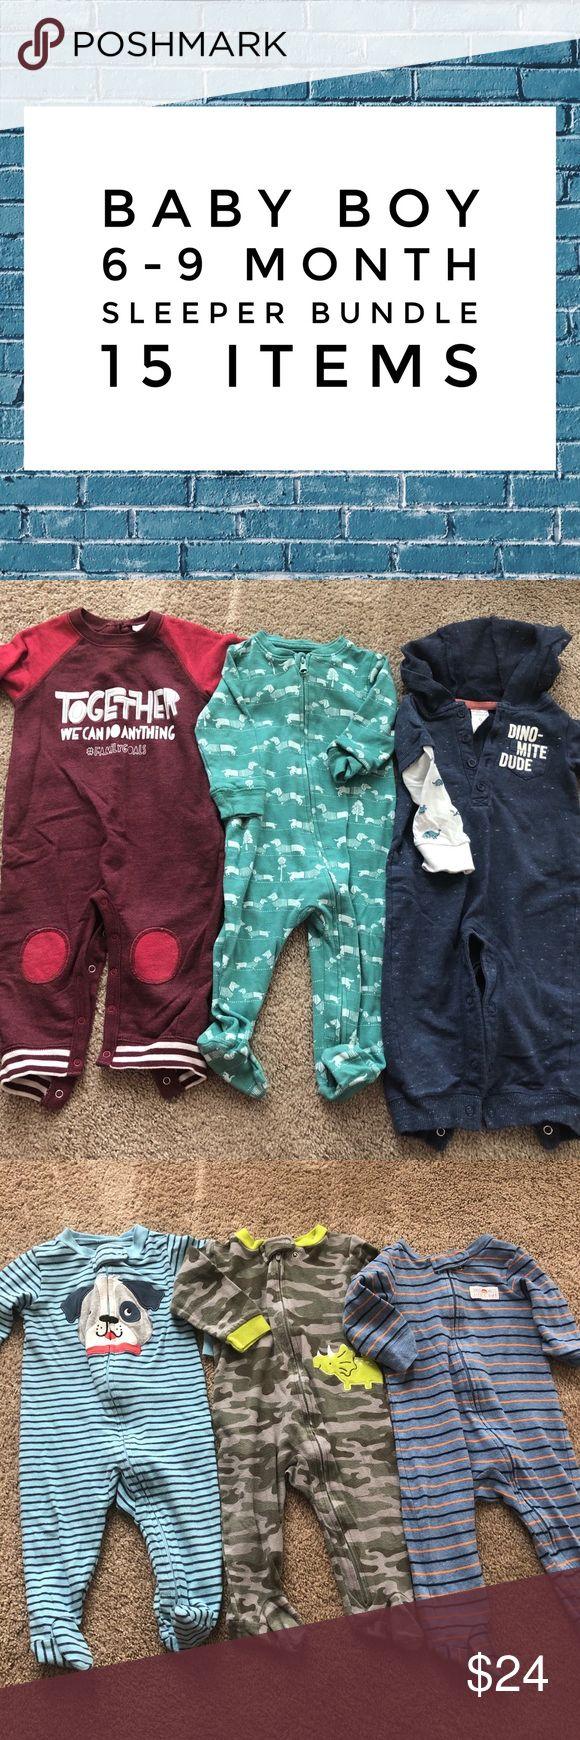 Infant Boy 69 Months Sleeper Bundle 15 items. All boys 6